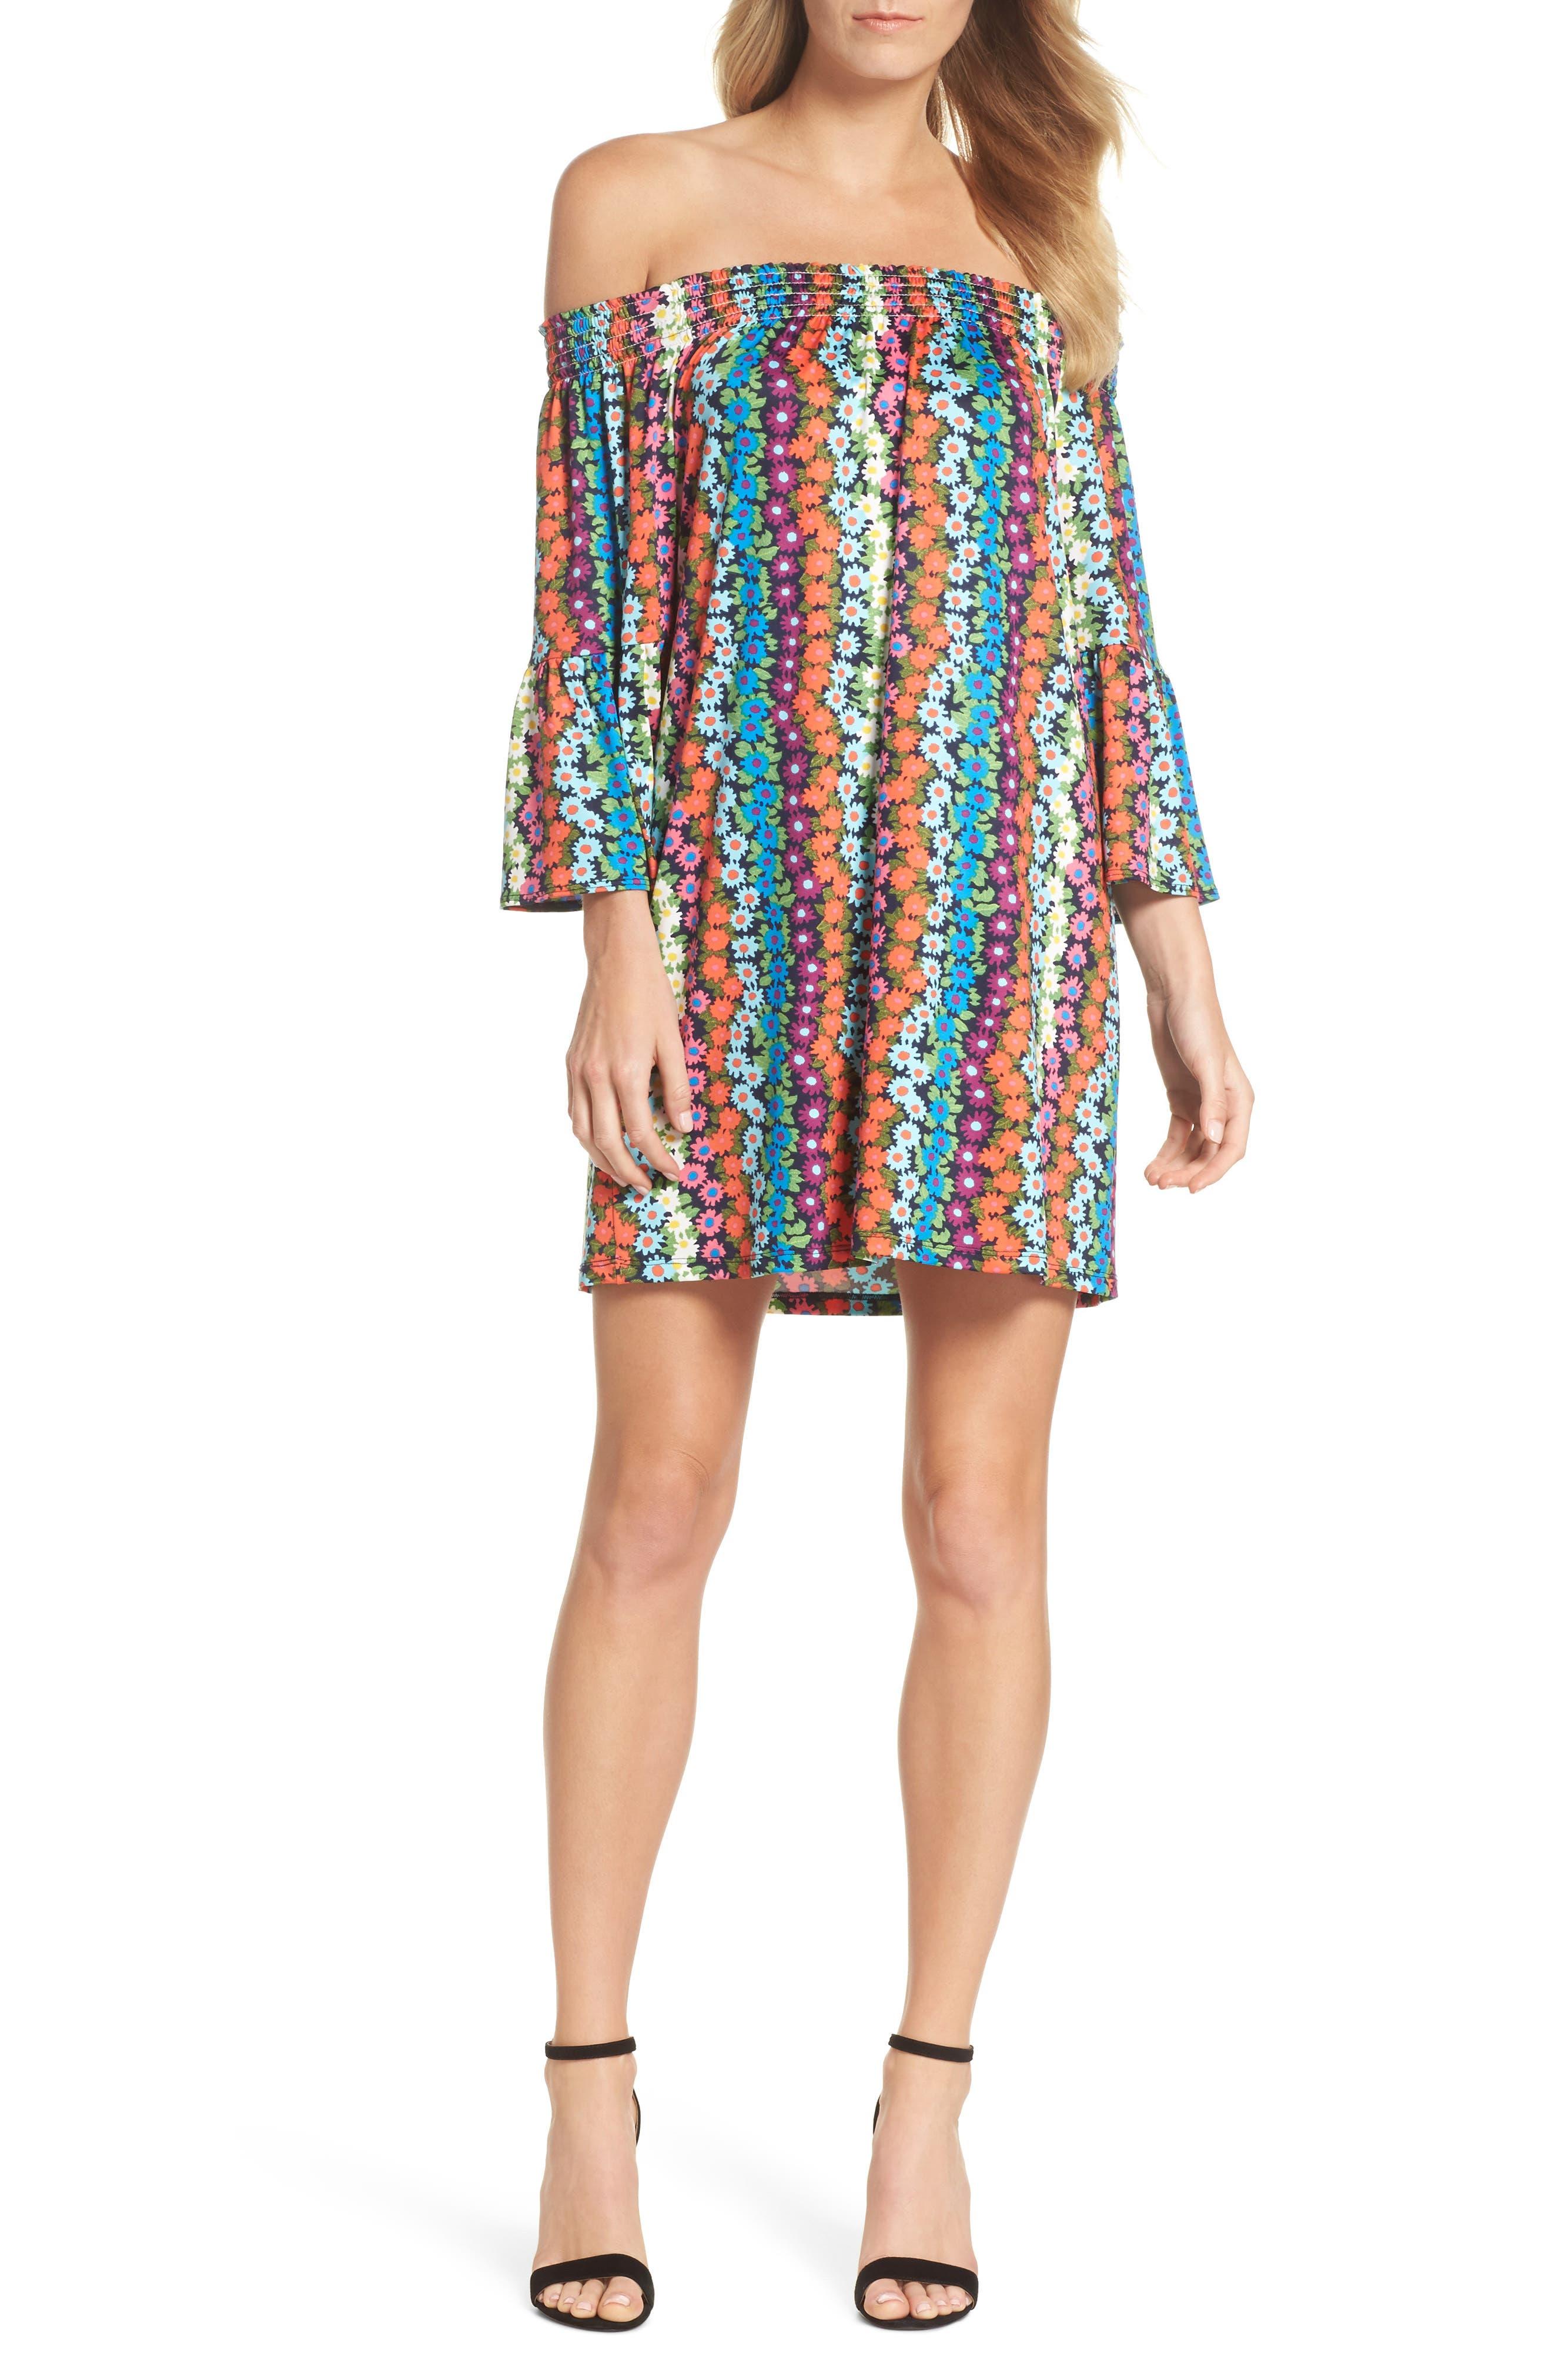 Trina Turk Off the Shoulder Bell Sleeve Dress,                         Main,                         color, 460